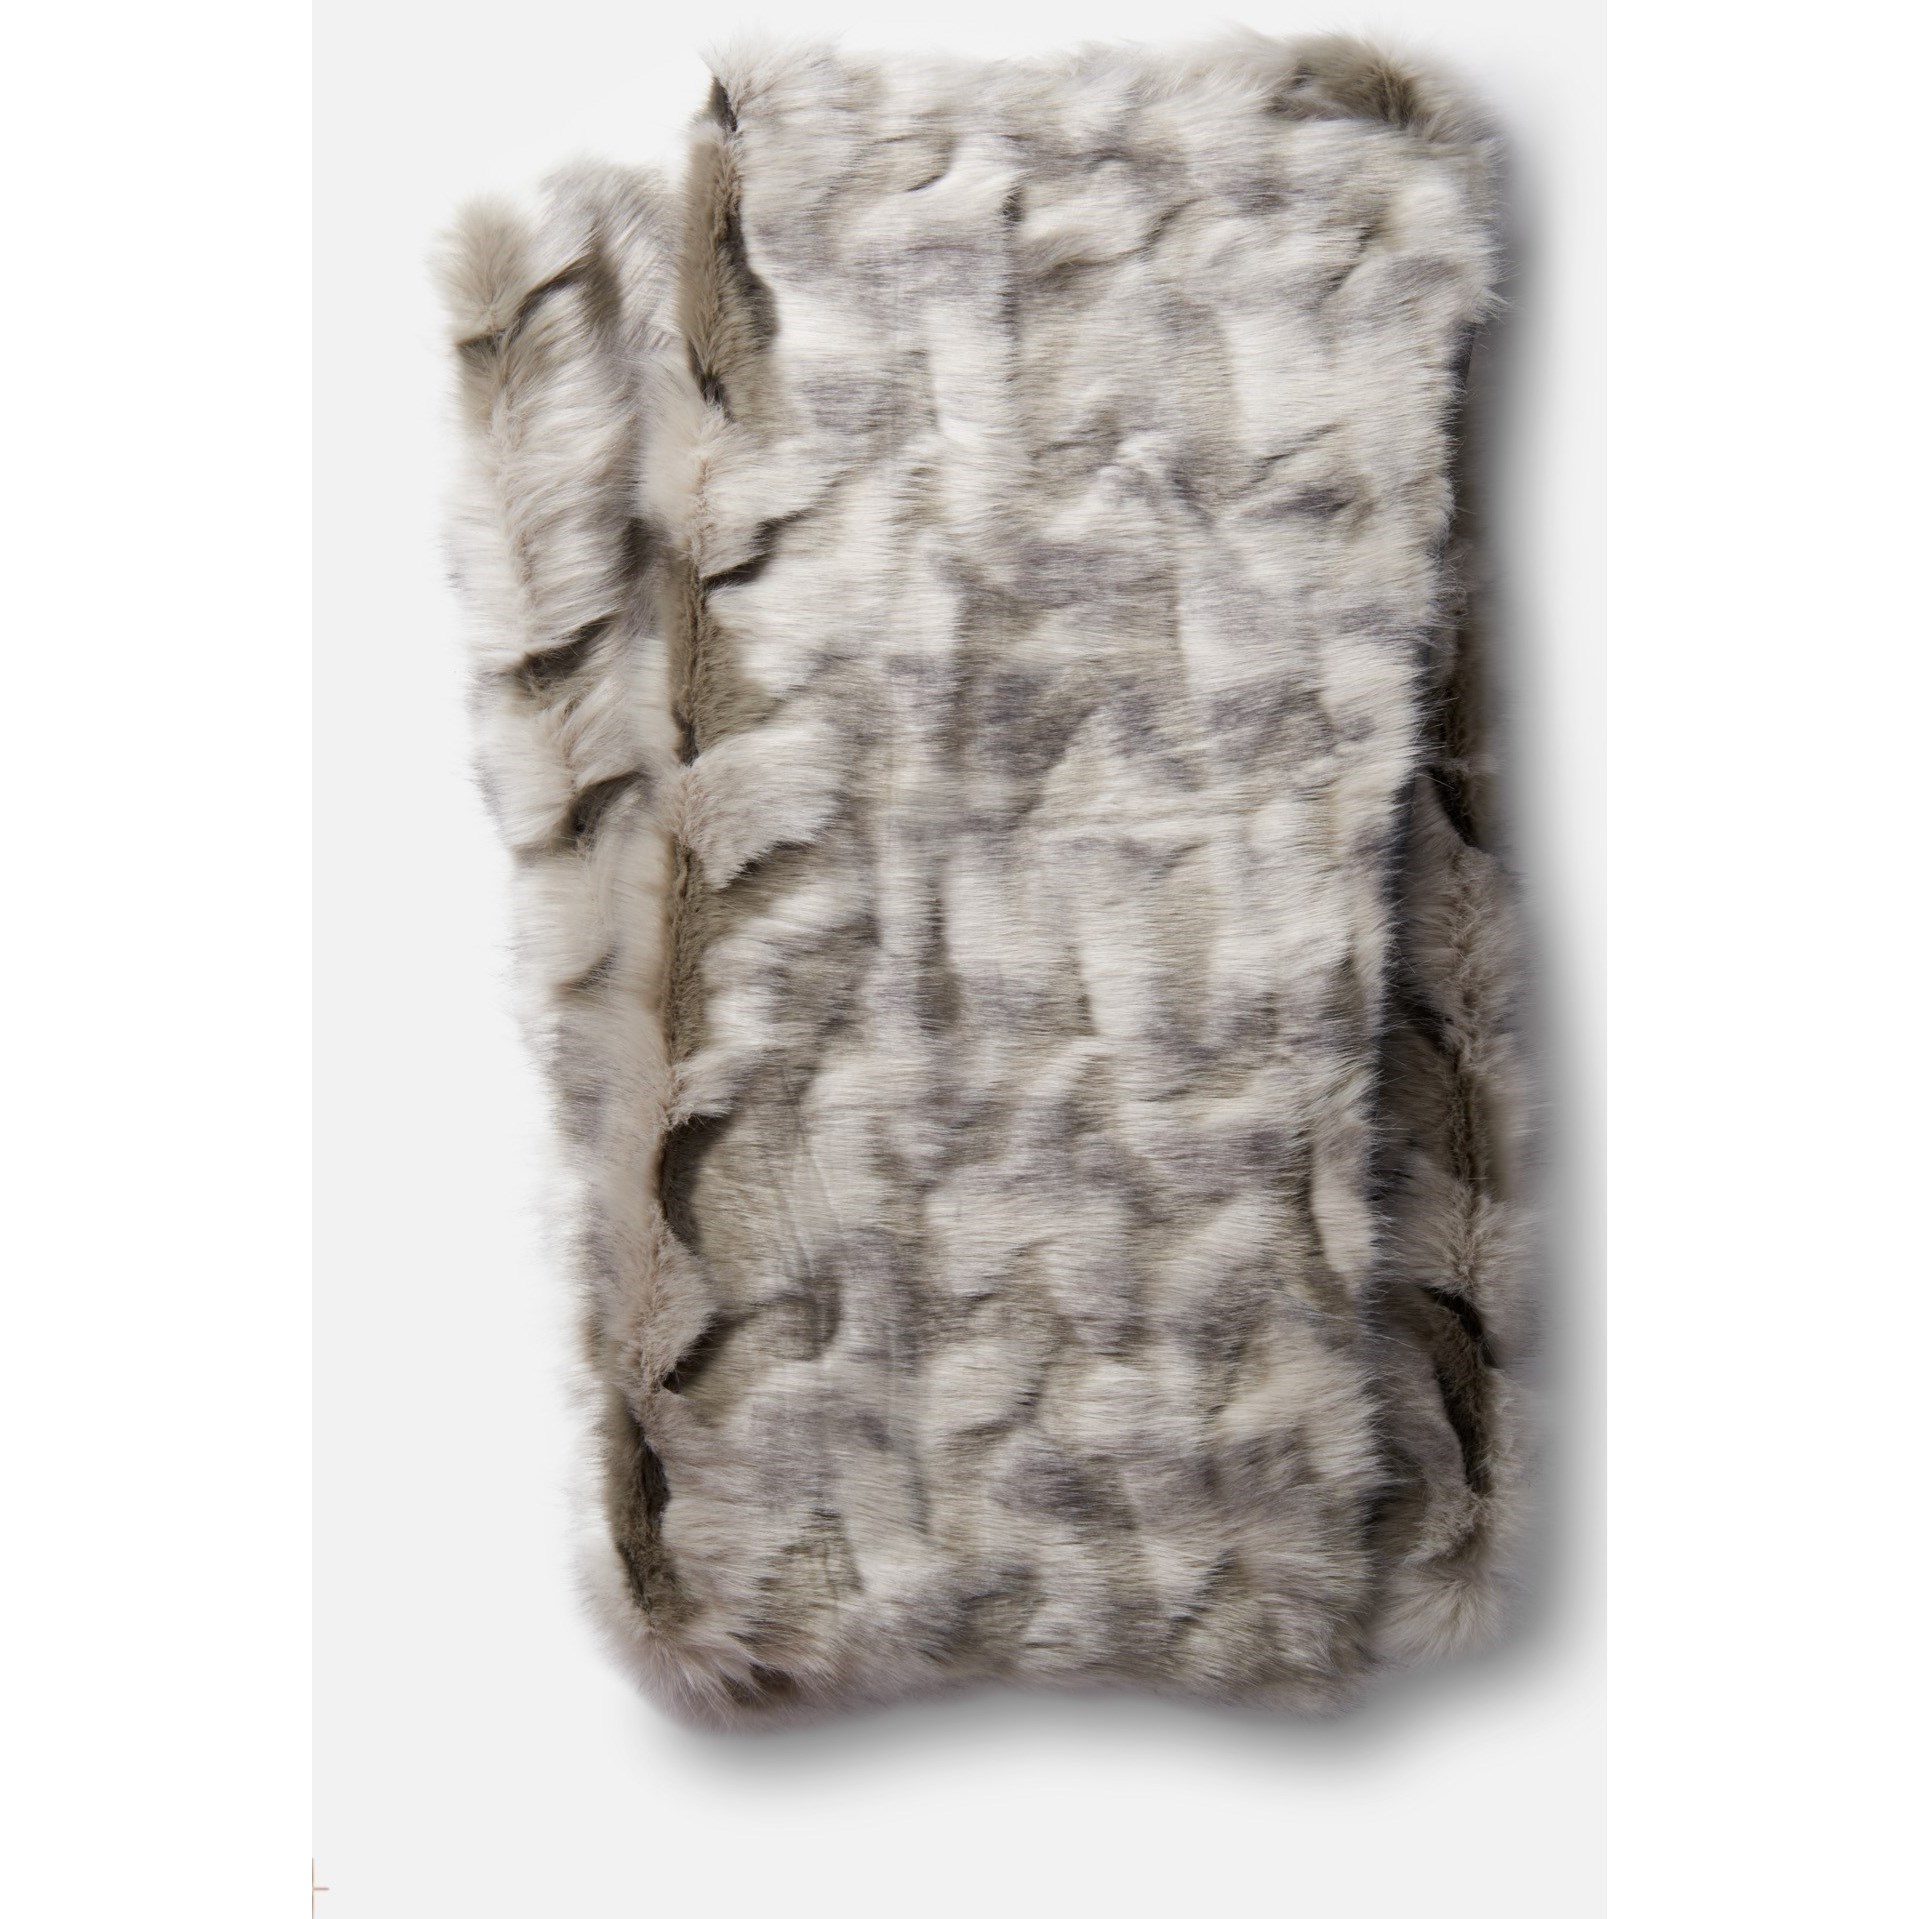 Loloi Rugs Zora Grey 100 Acrylic Throw Blanket Belfort